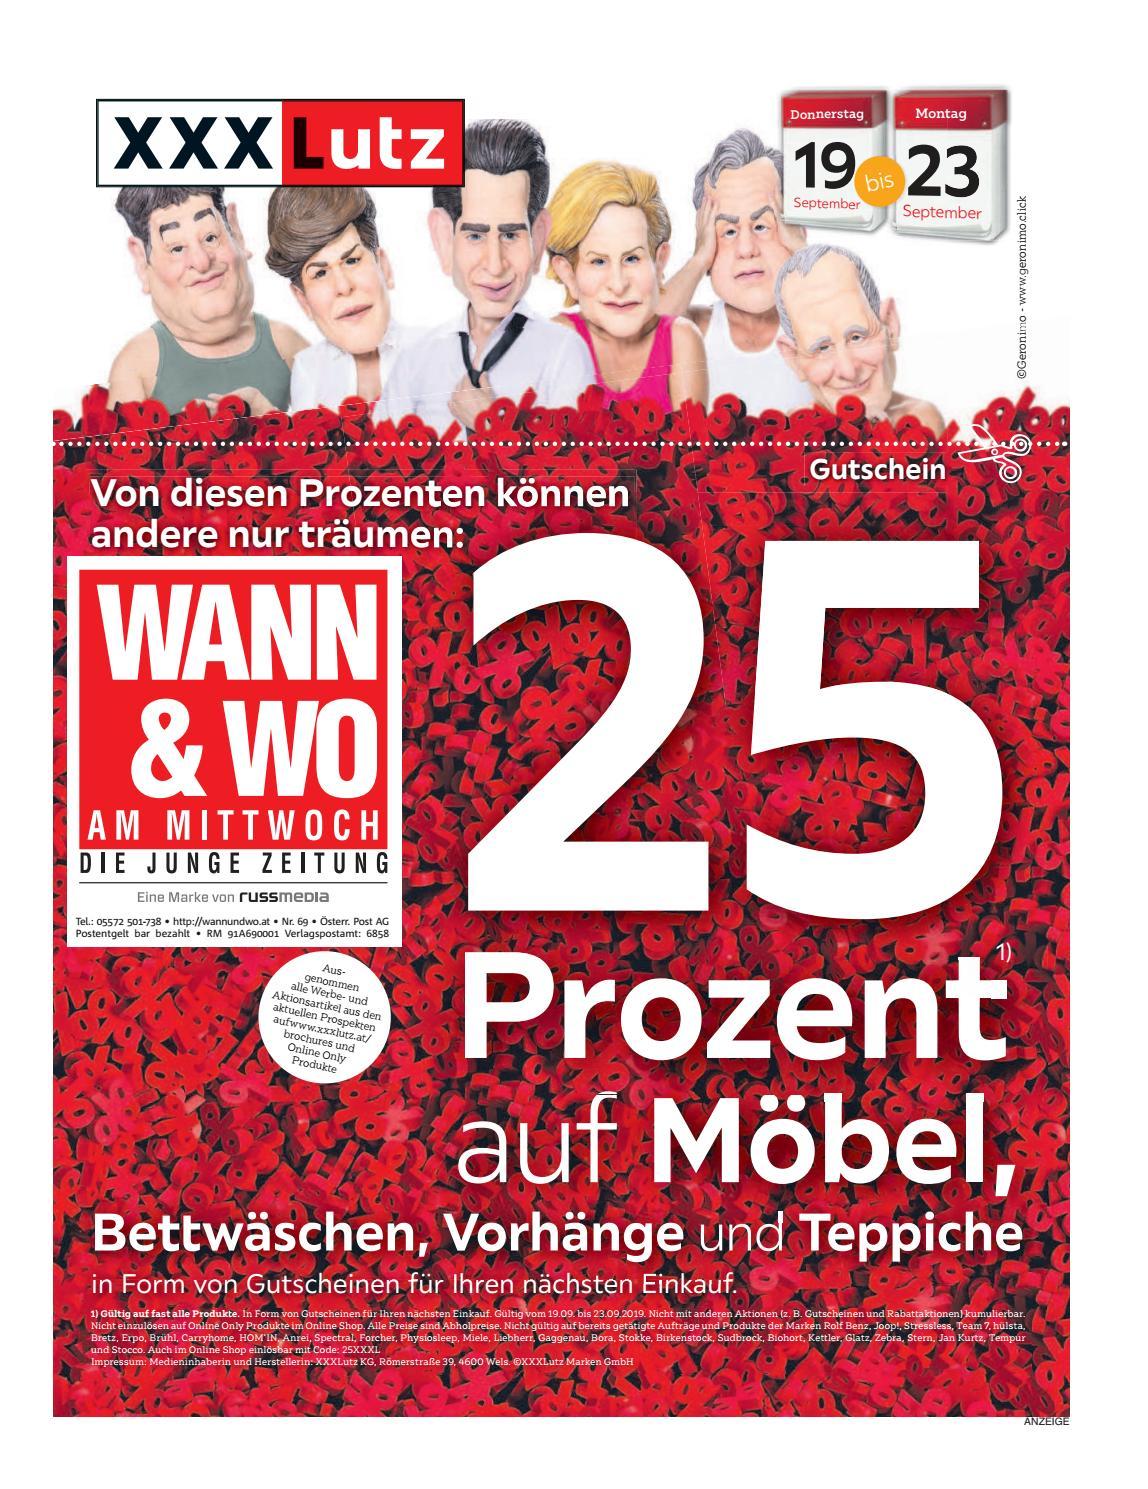 Andelsbuch single frau: Singlebrsen in deuchendorf